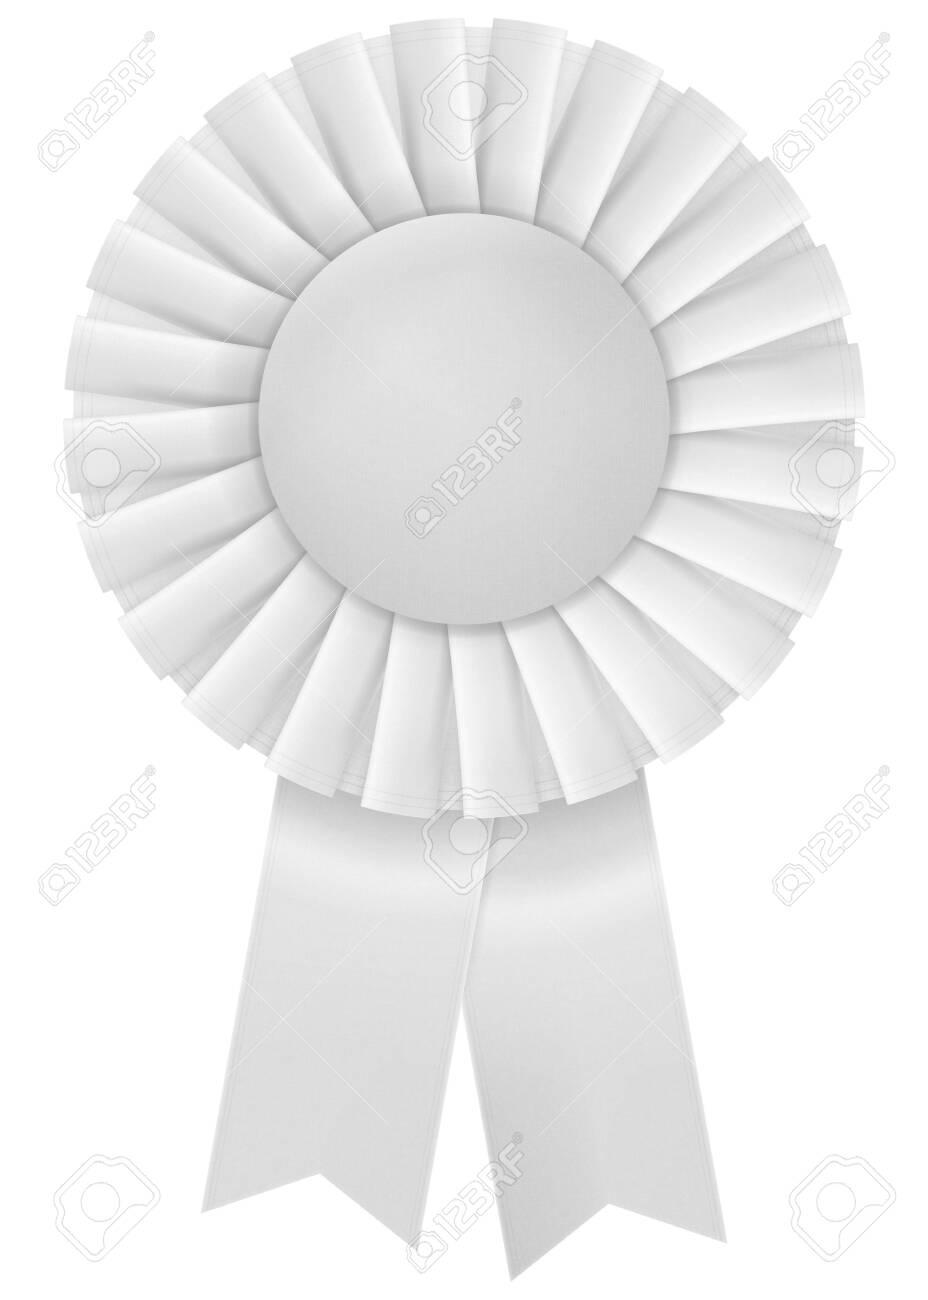 A white third place prize ribbon on white - 150735478